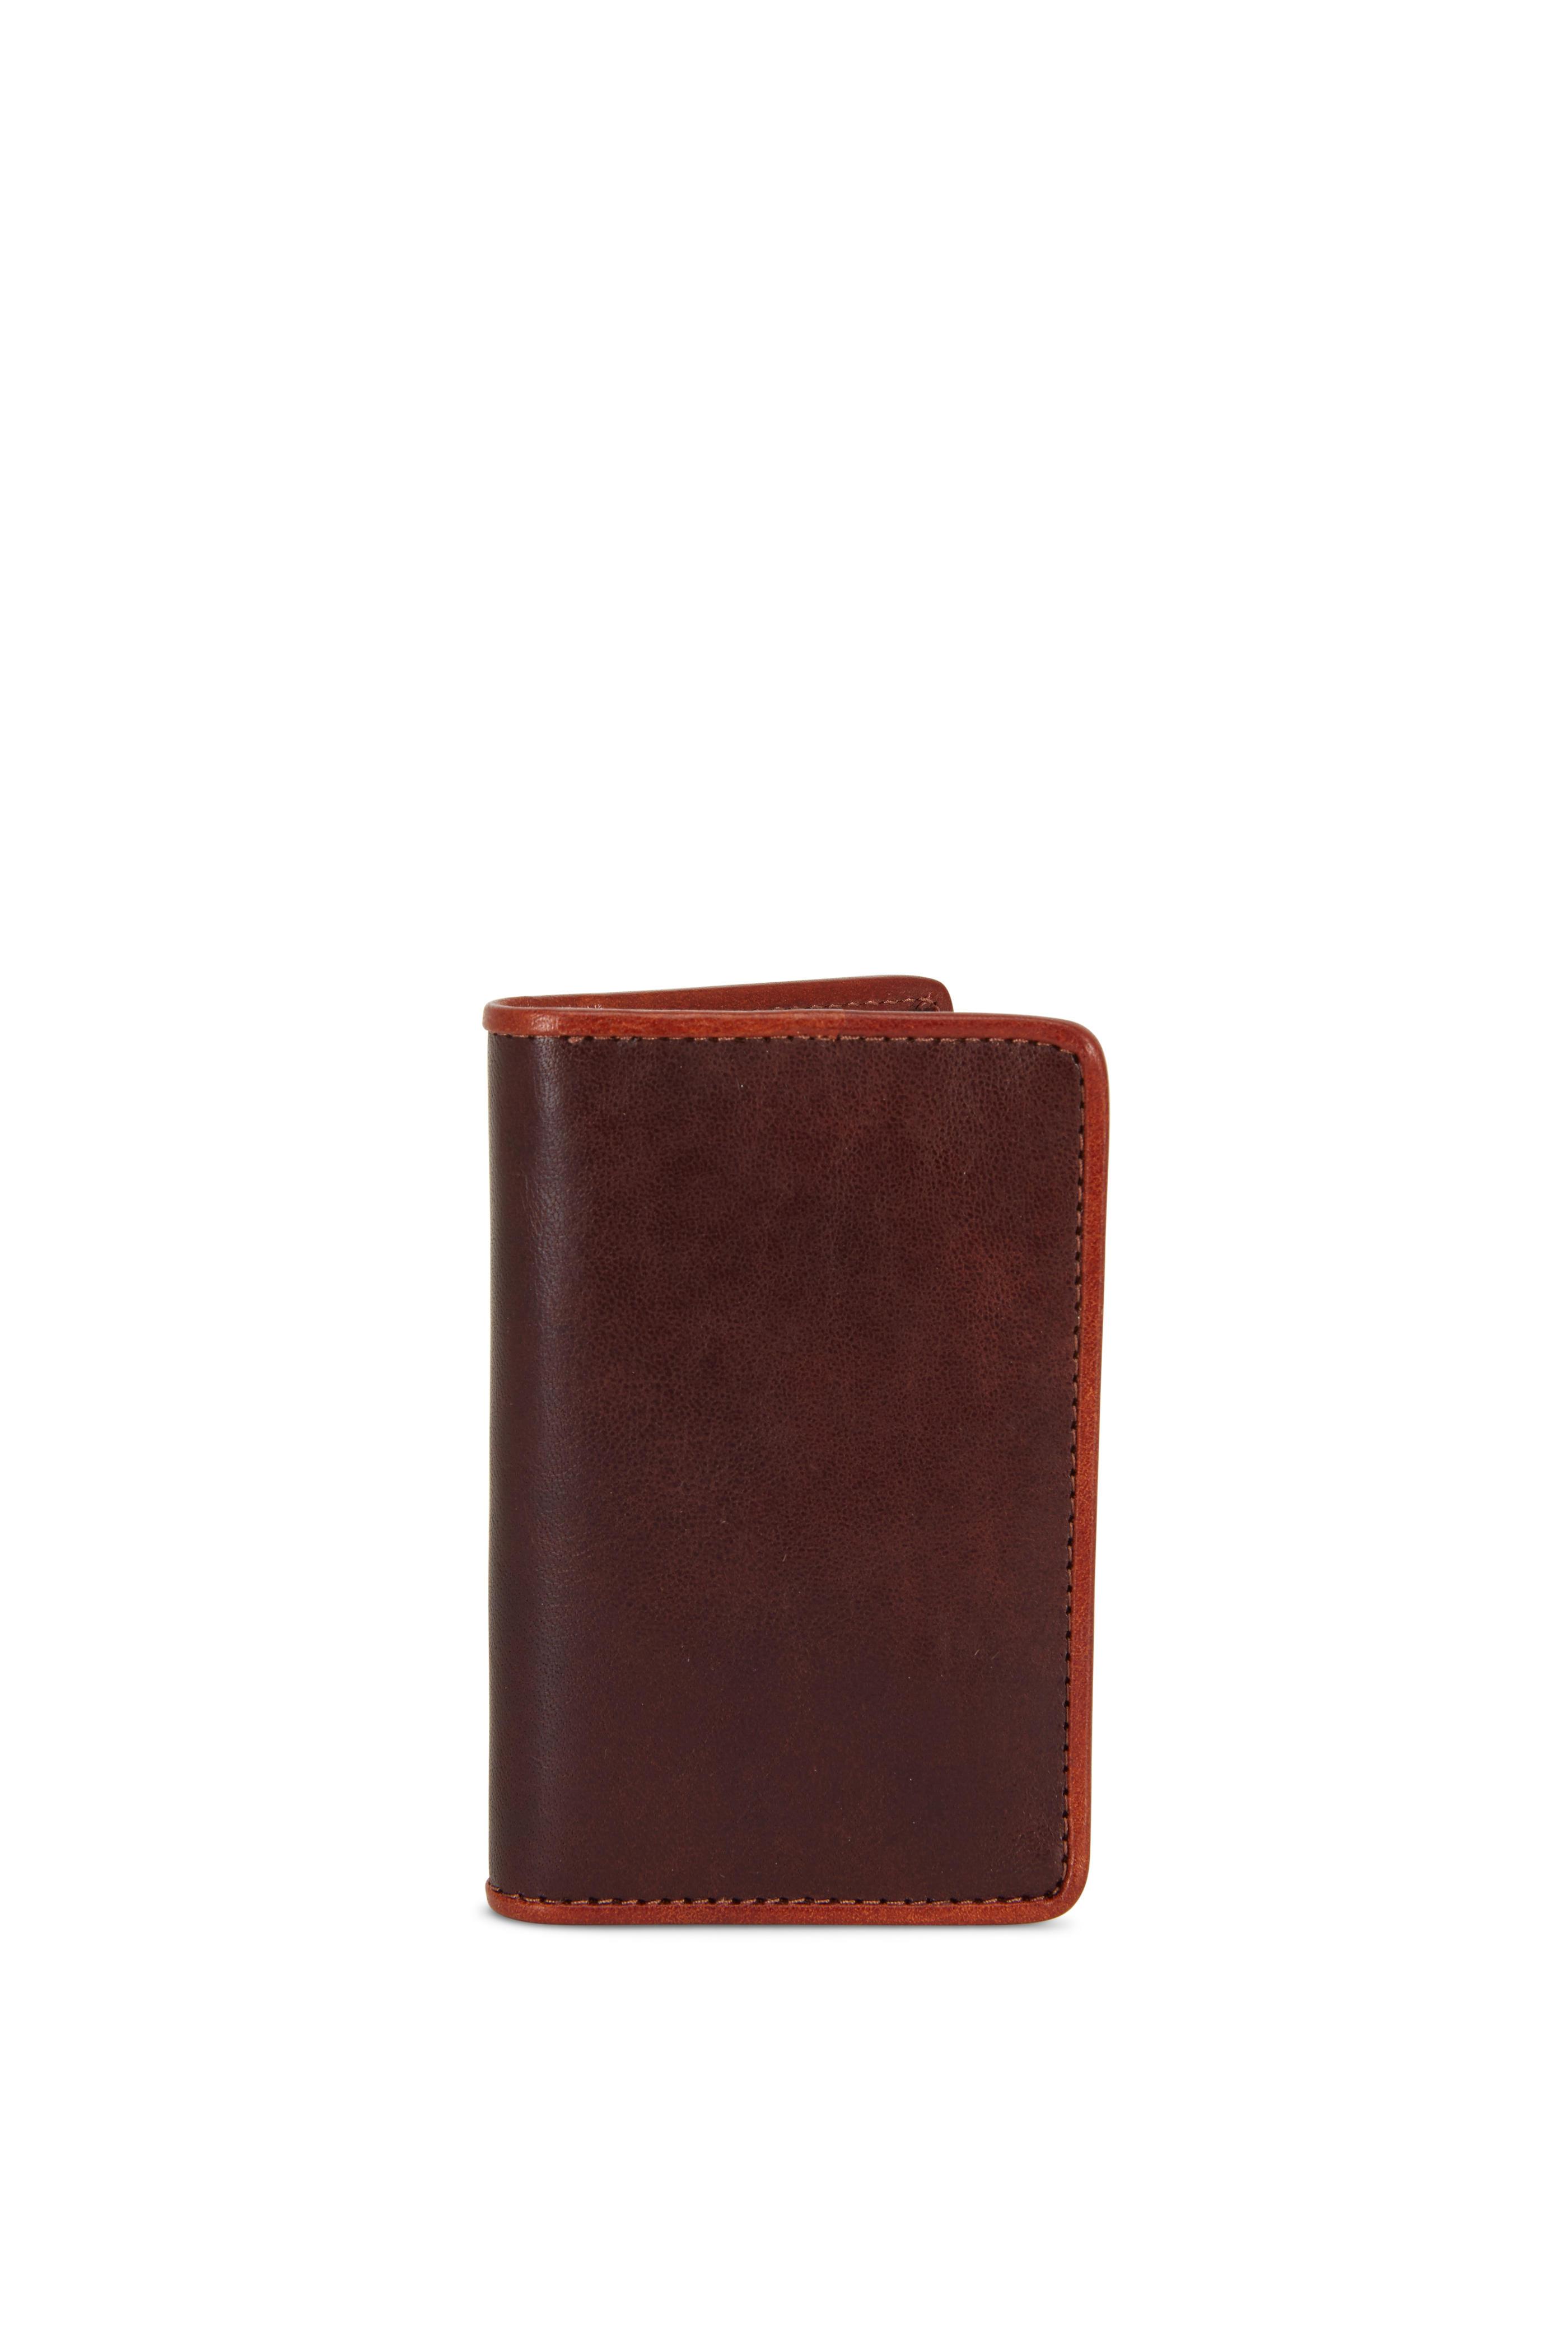 buy online fda13 c7ec8 Bosca - Dark Brown & Amber Leather Calling Card Case   Mitchell Stores